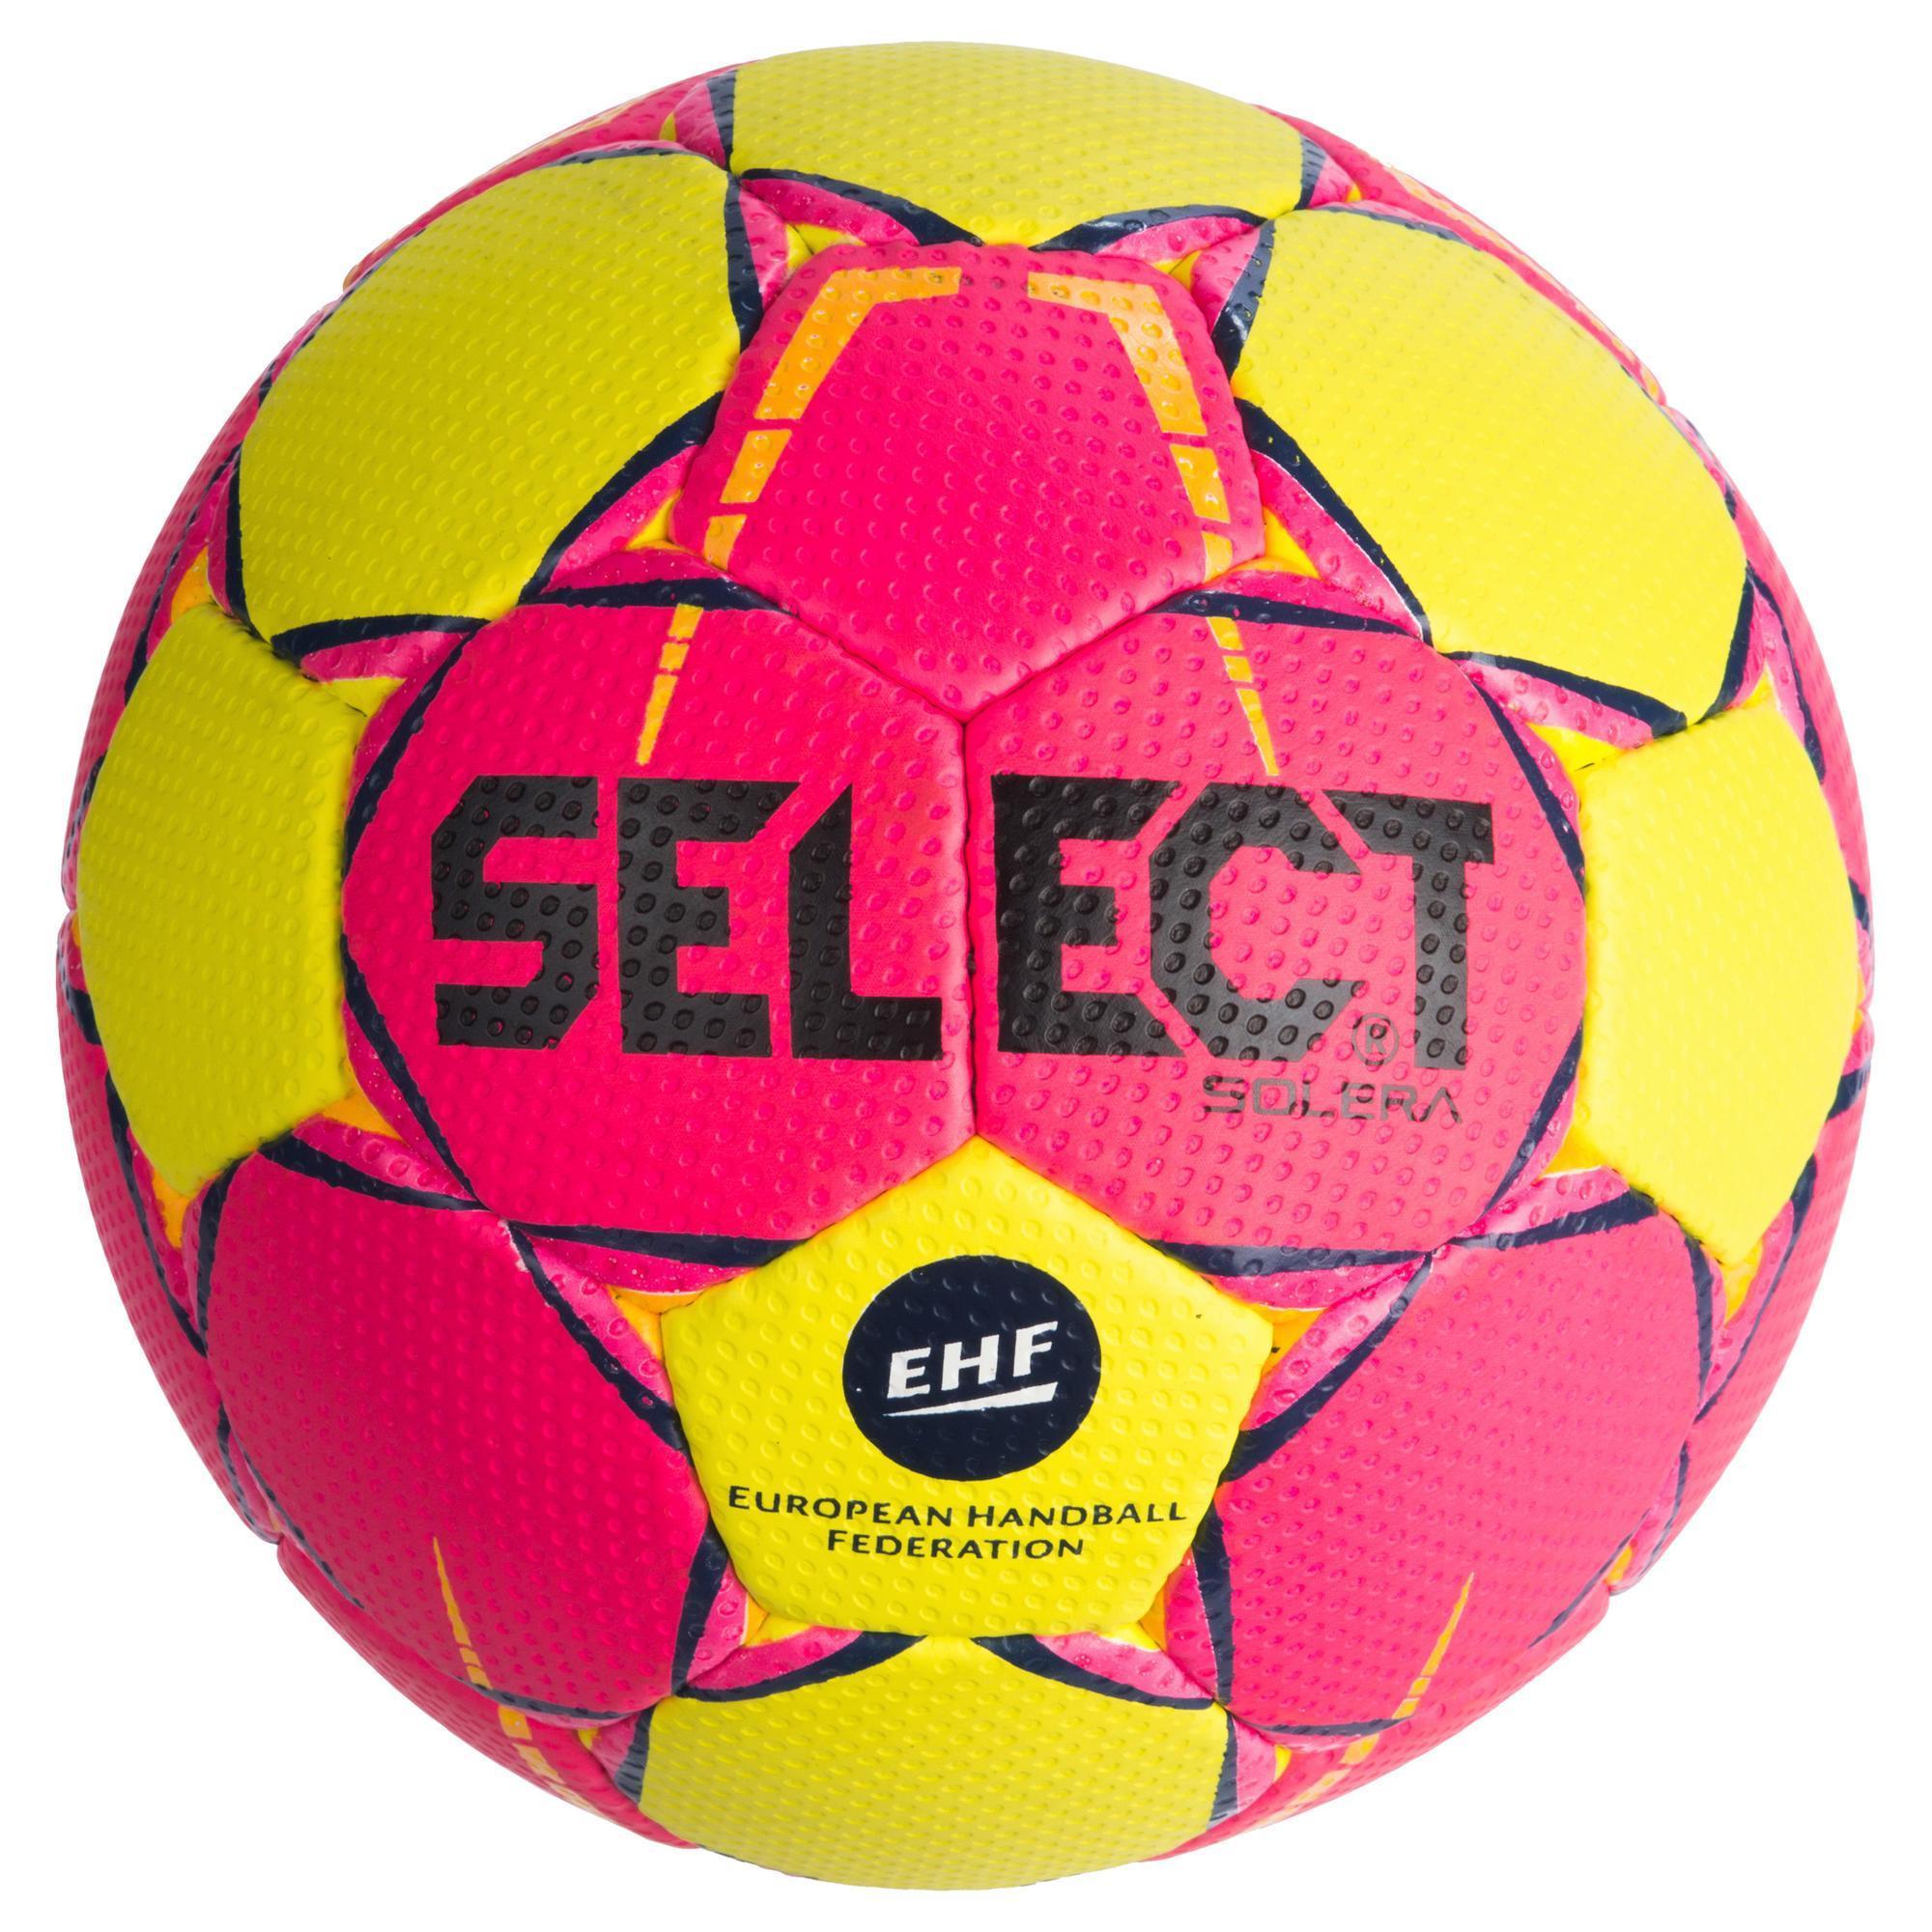 Comprar Balones de Balonmano online  deadc6d83447c